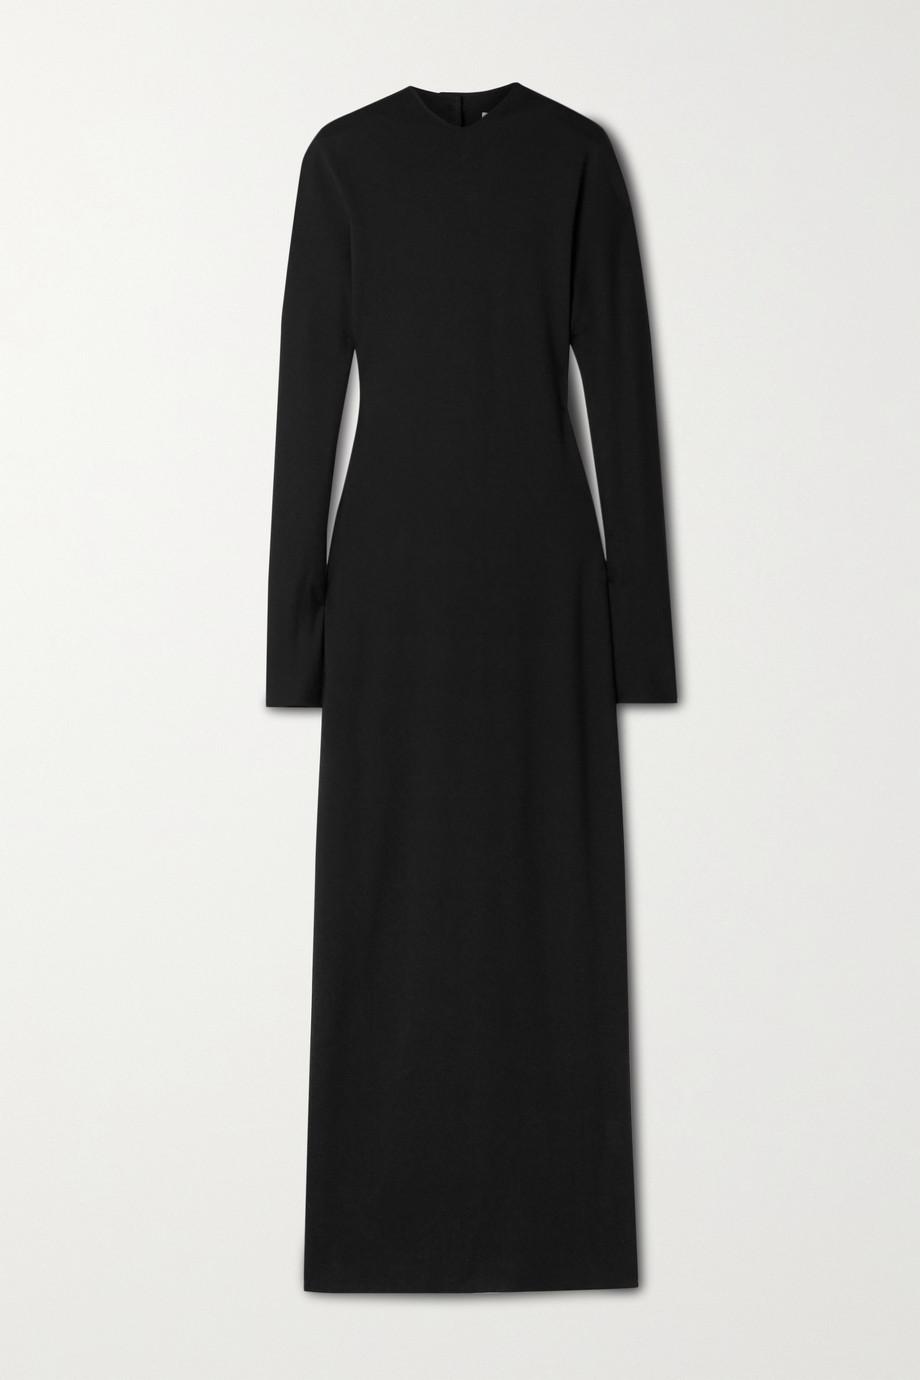 The Row Crispiano stretch-jersey maxi dress